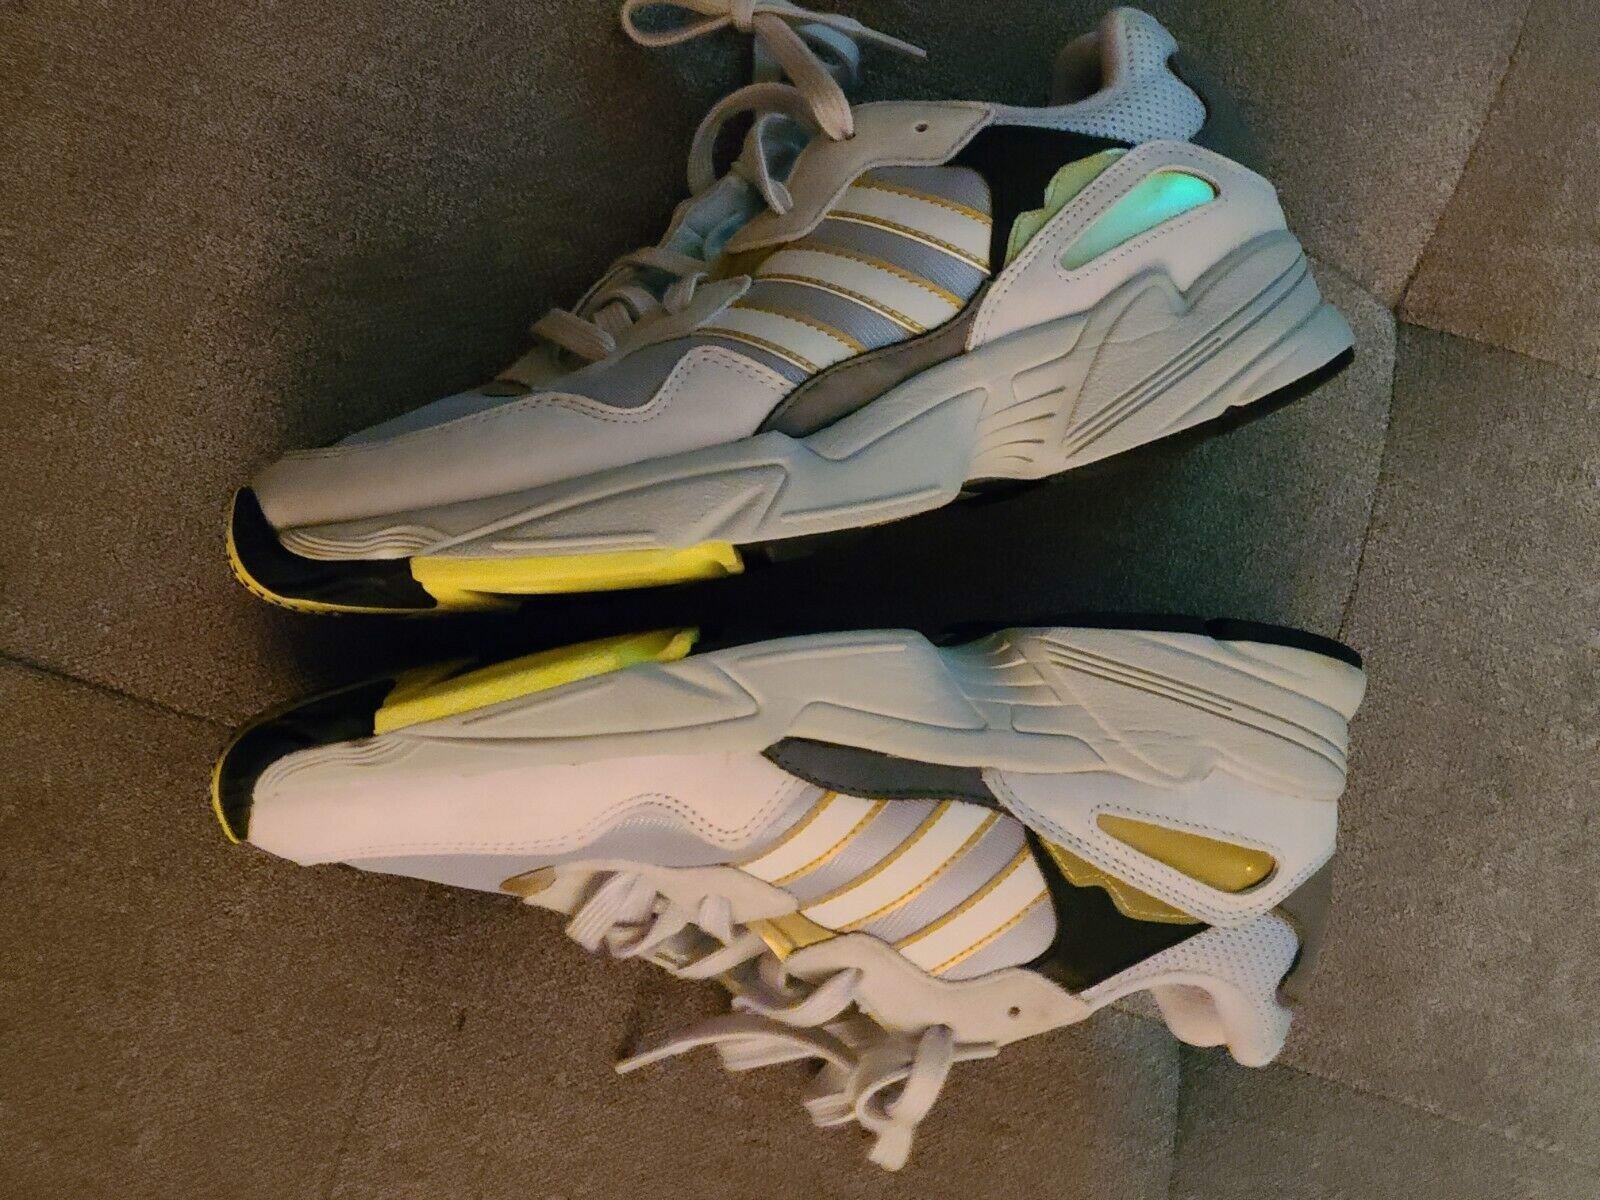 https://authentic-shoes.com/blogs/news/yung-96-mot-trong-nhung-di-san-song-lai-cua-adidas-originals